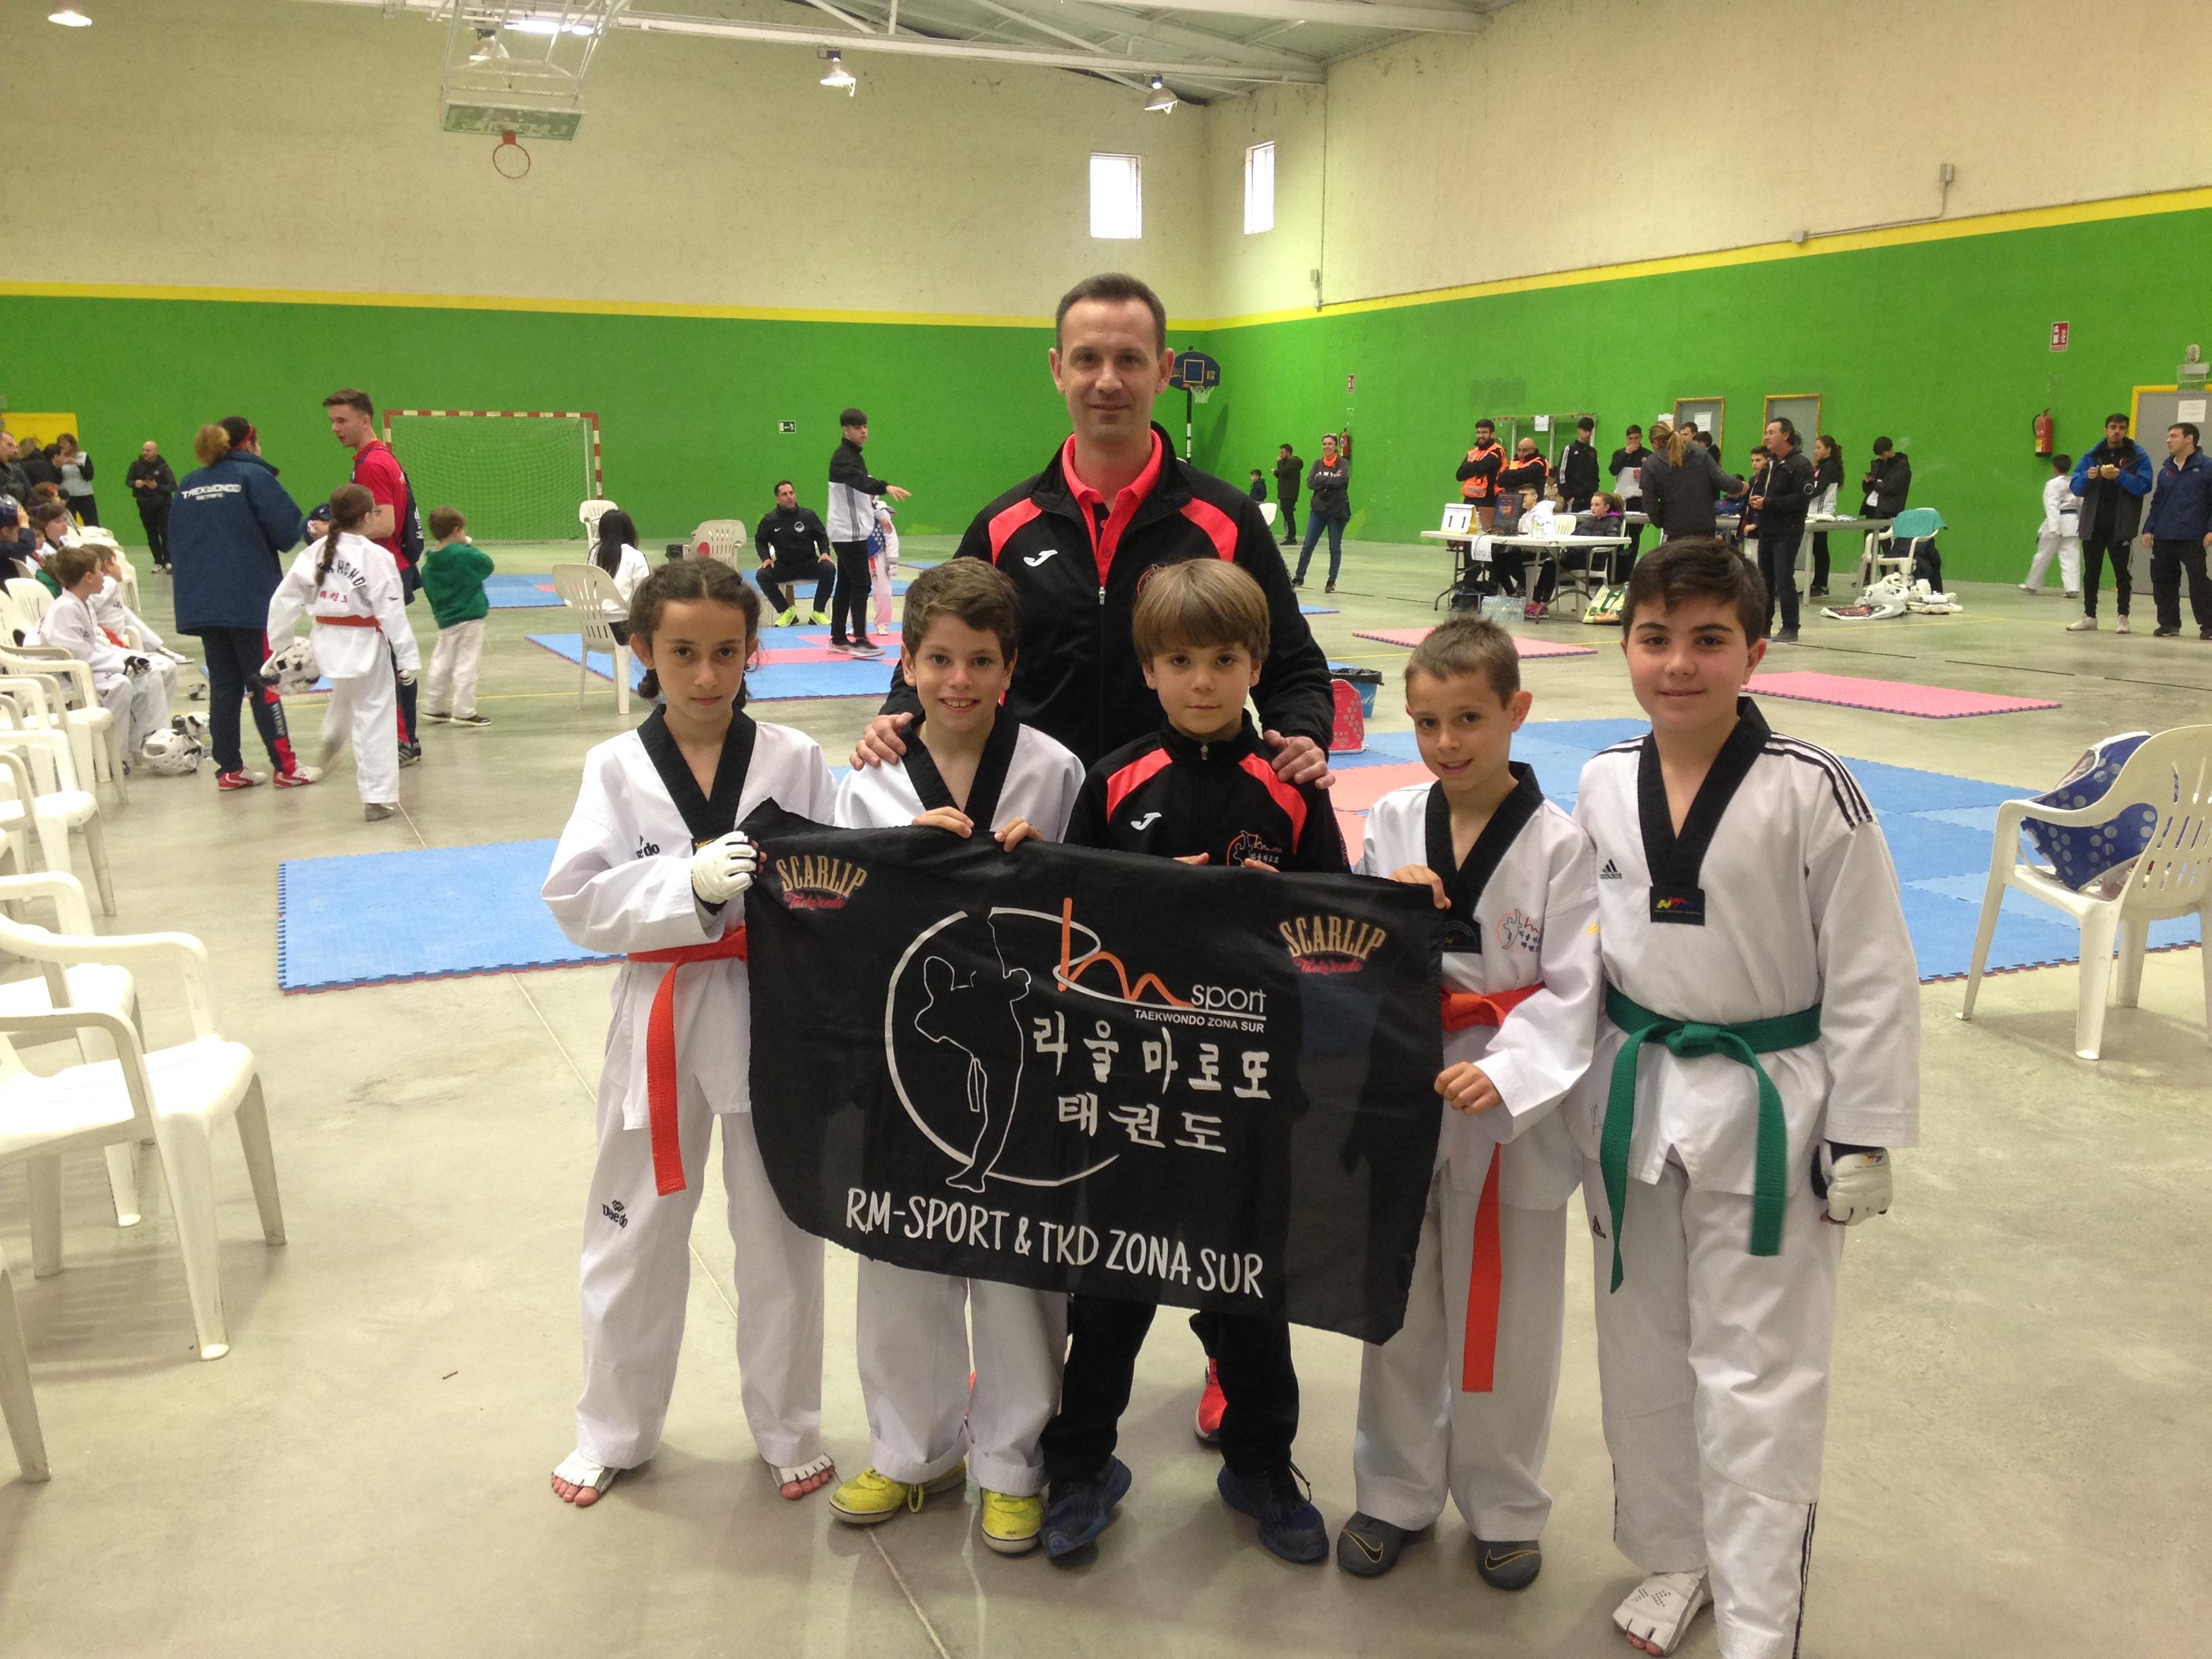 Nuevos éxitos para la cantera del CD Taekwondo RM-Sport&TKD Zona Sur